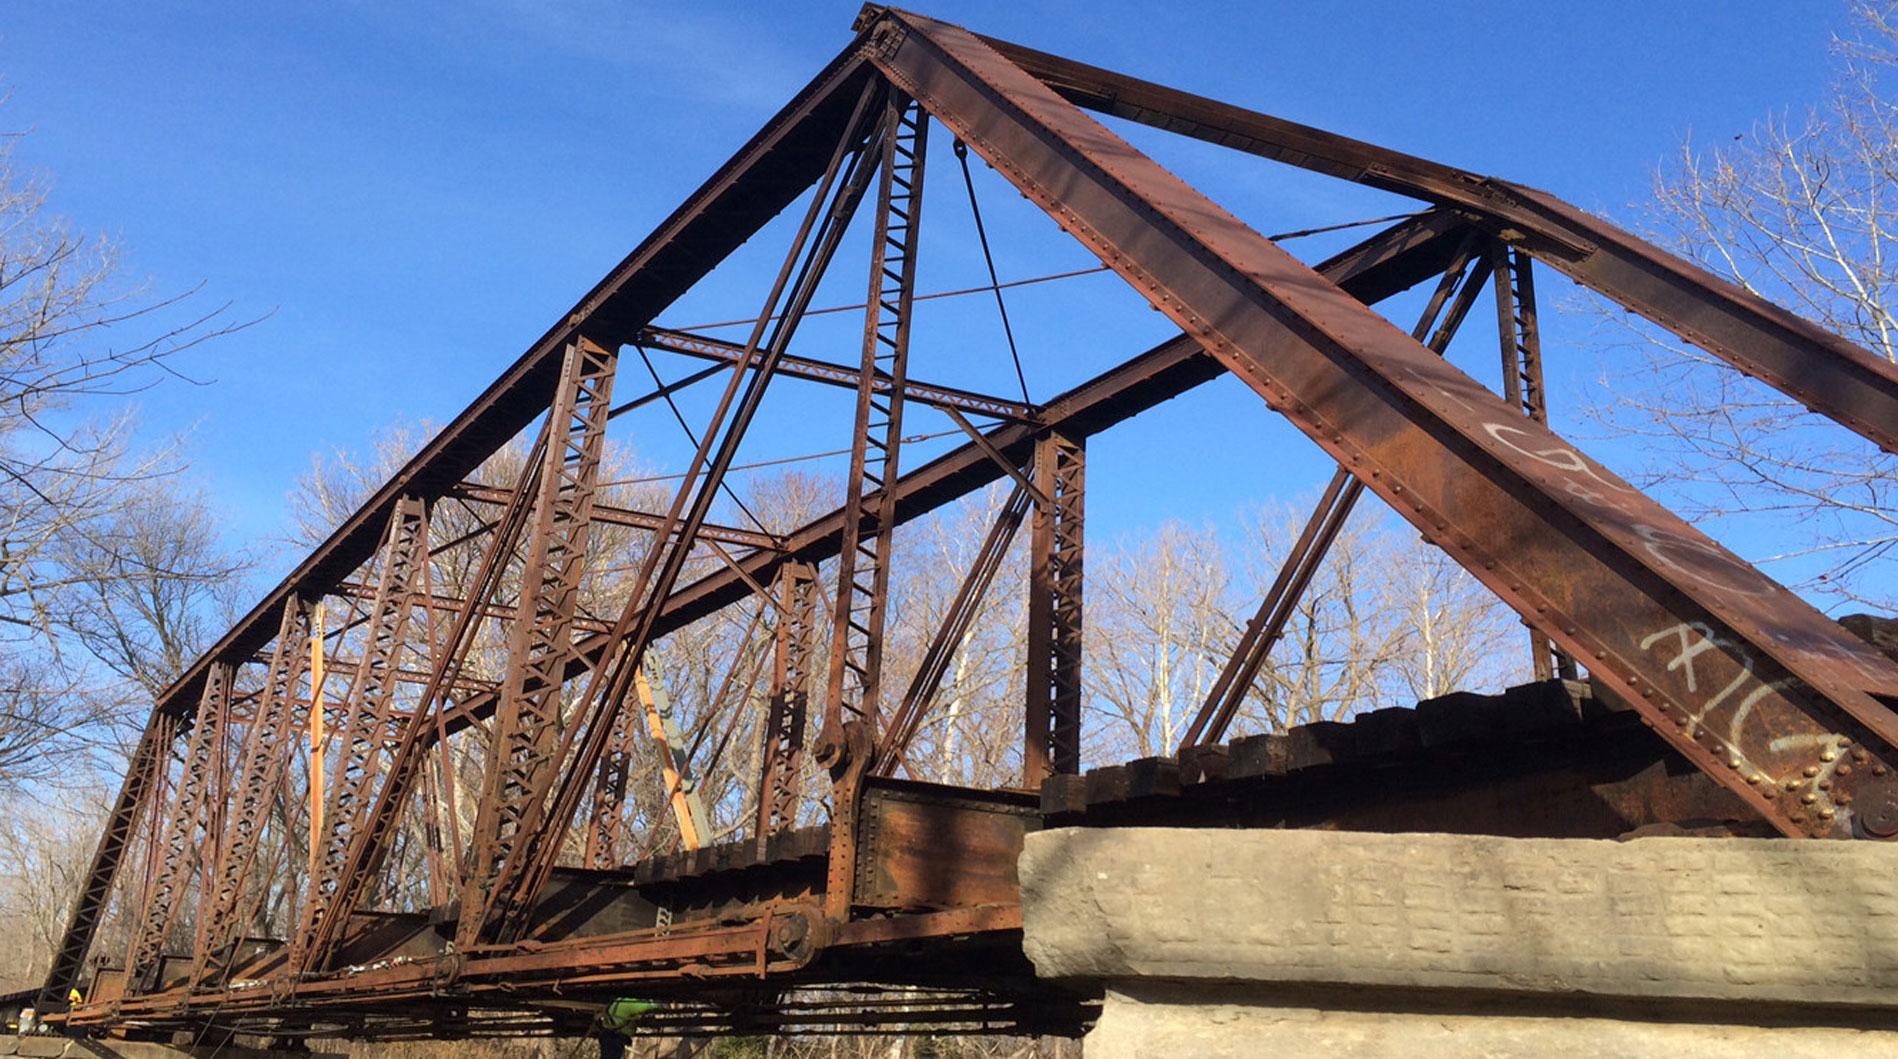 Dr. Sim is working to transfer the Nebraska Department of Roads' bridge database to the DataCenterHub platform.